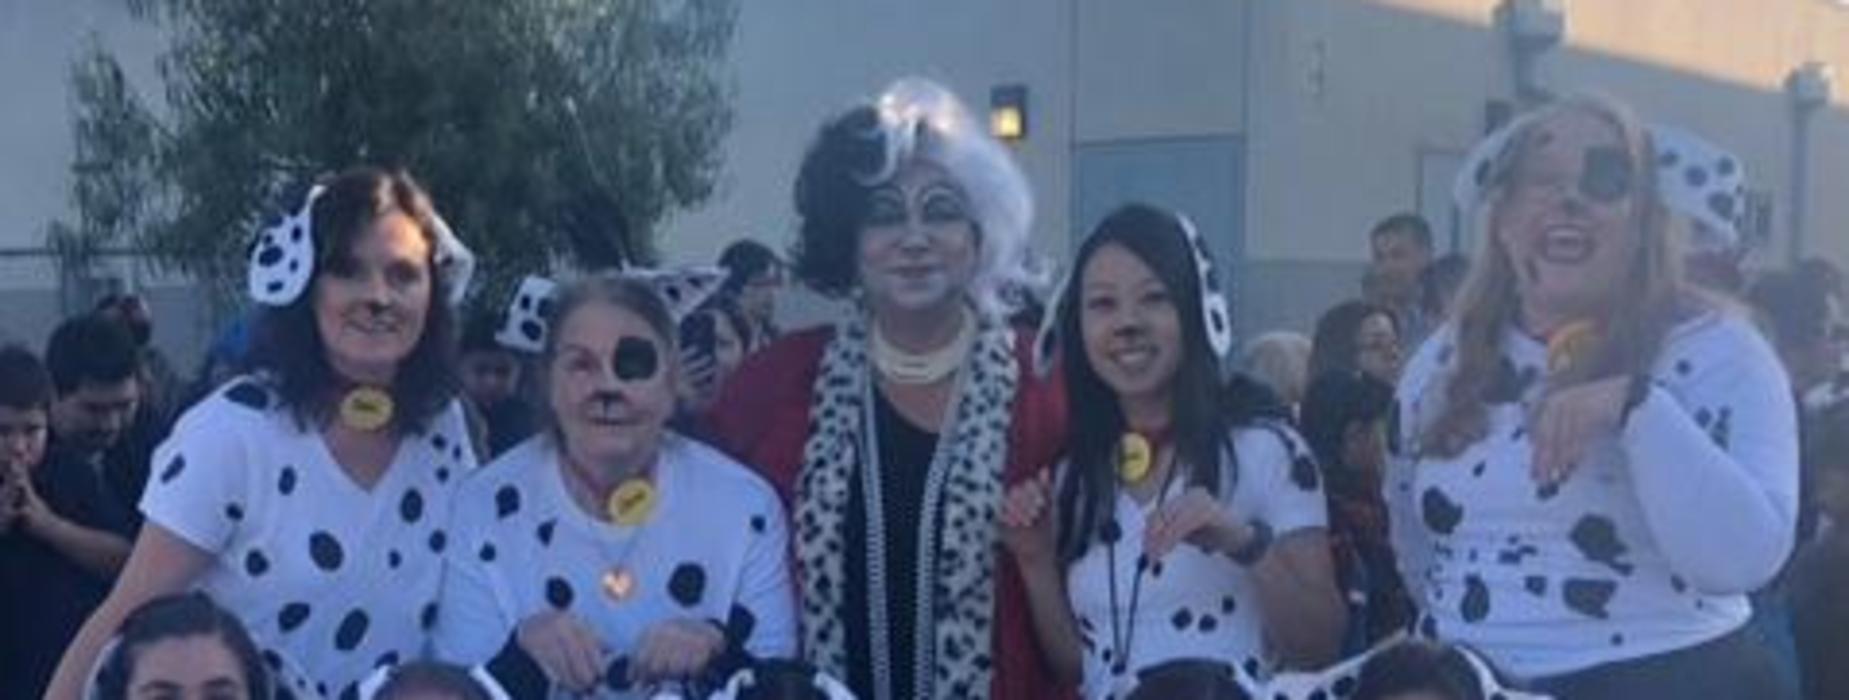 Marguerita Faculty during Halloween